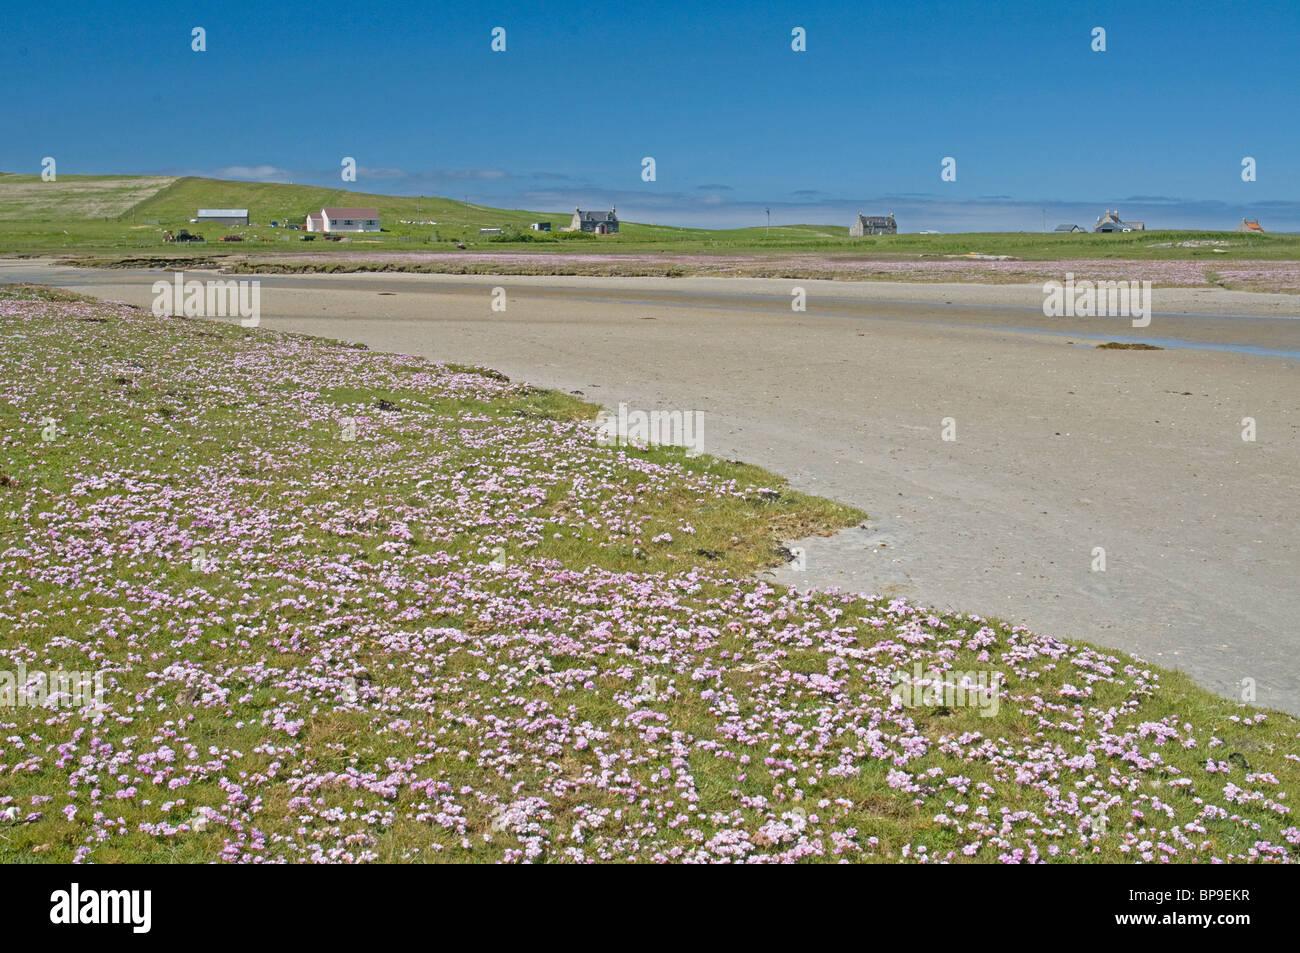 Machair in Summer, North Uist, Outer Hebrides, Western Isles, Scotland.  SCO 6362 - Stock Image